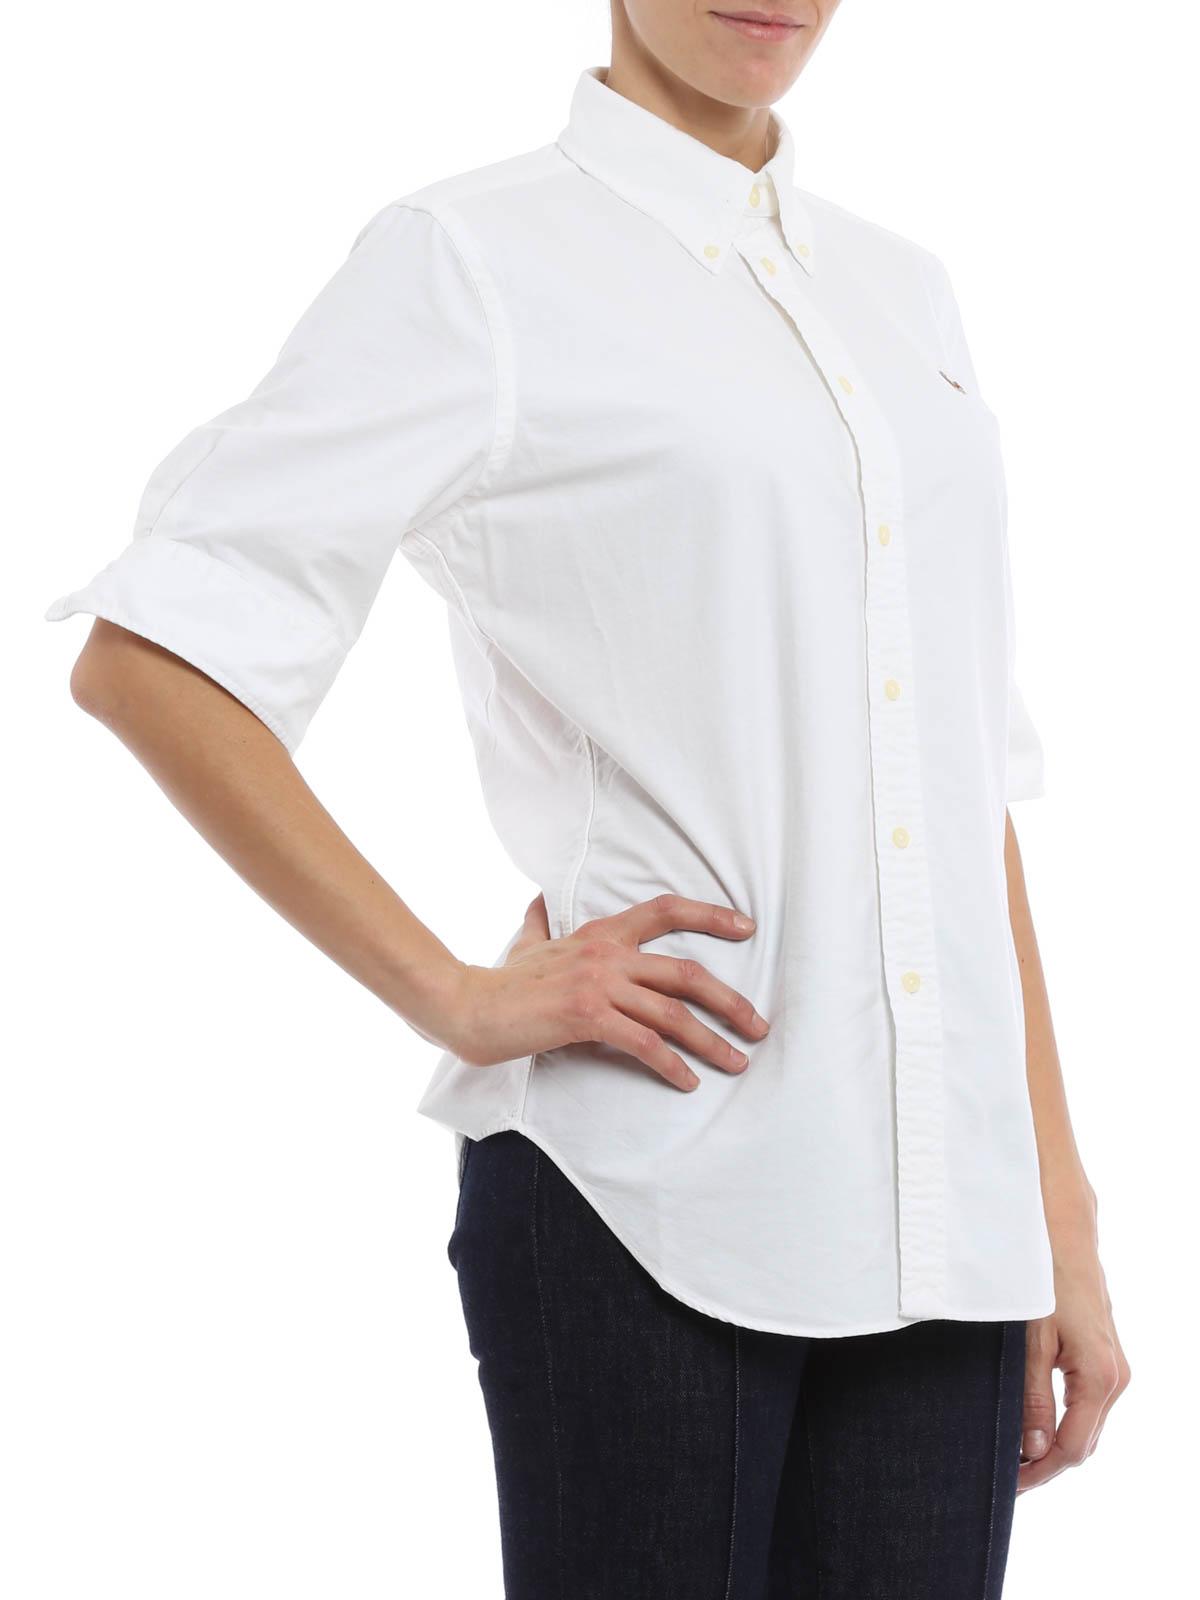 28021408ff7ae Polo Ralph Lauren - Camisa Blanca Para Mujer - Camisas - V33 IOJEY ...